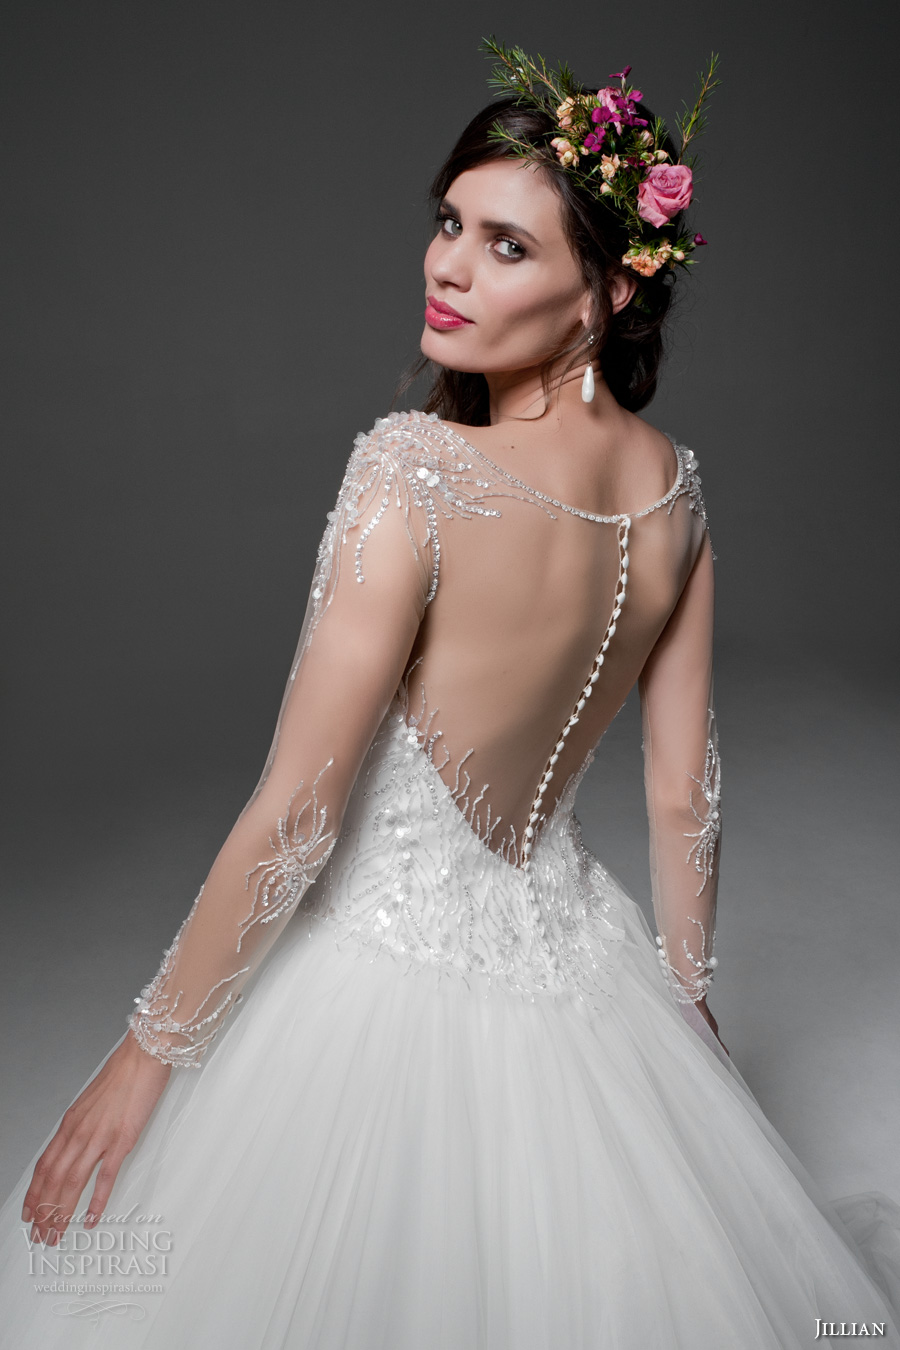 jillian 2017 bridal sheer long sleeves illusion bateau sweetheart neckline heavily embellished bodice tulle skirt princess ball gown wedding dress sheer back royal train (maura) zbv